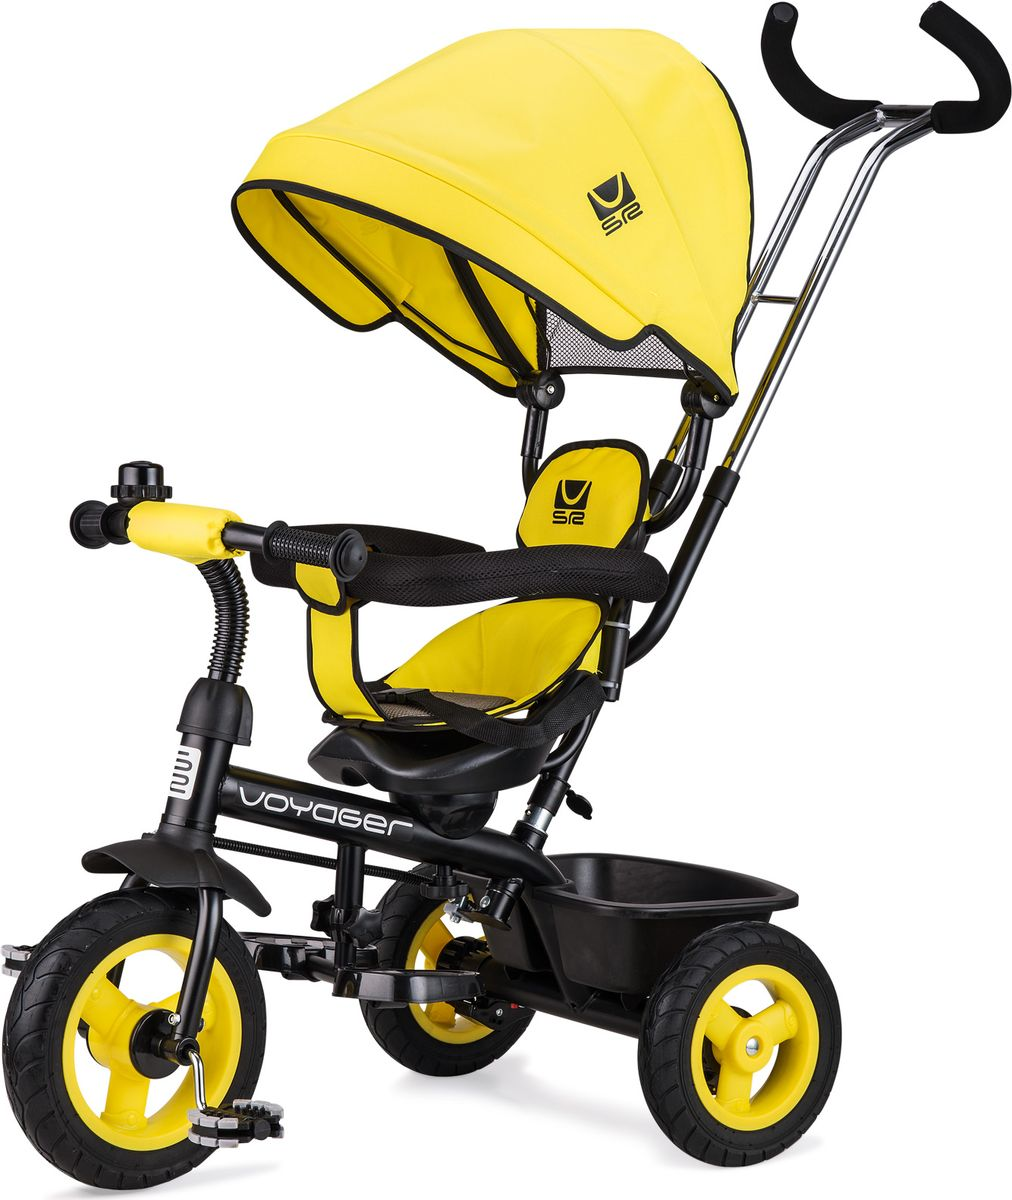 Small Rider Велосипед трехколесный Voyager цвет желтый -  Велосипеды-каталки